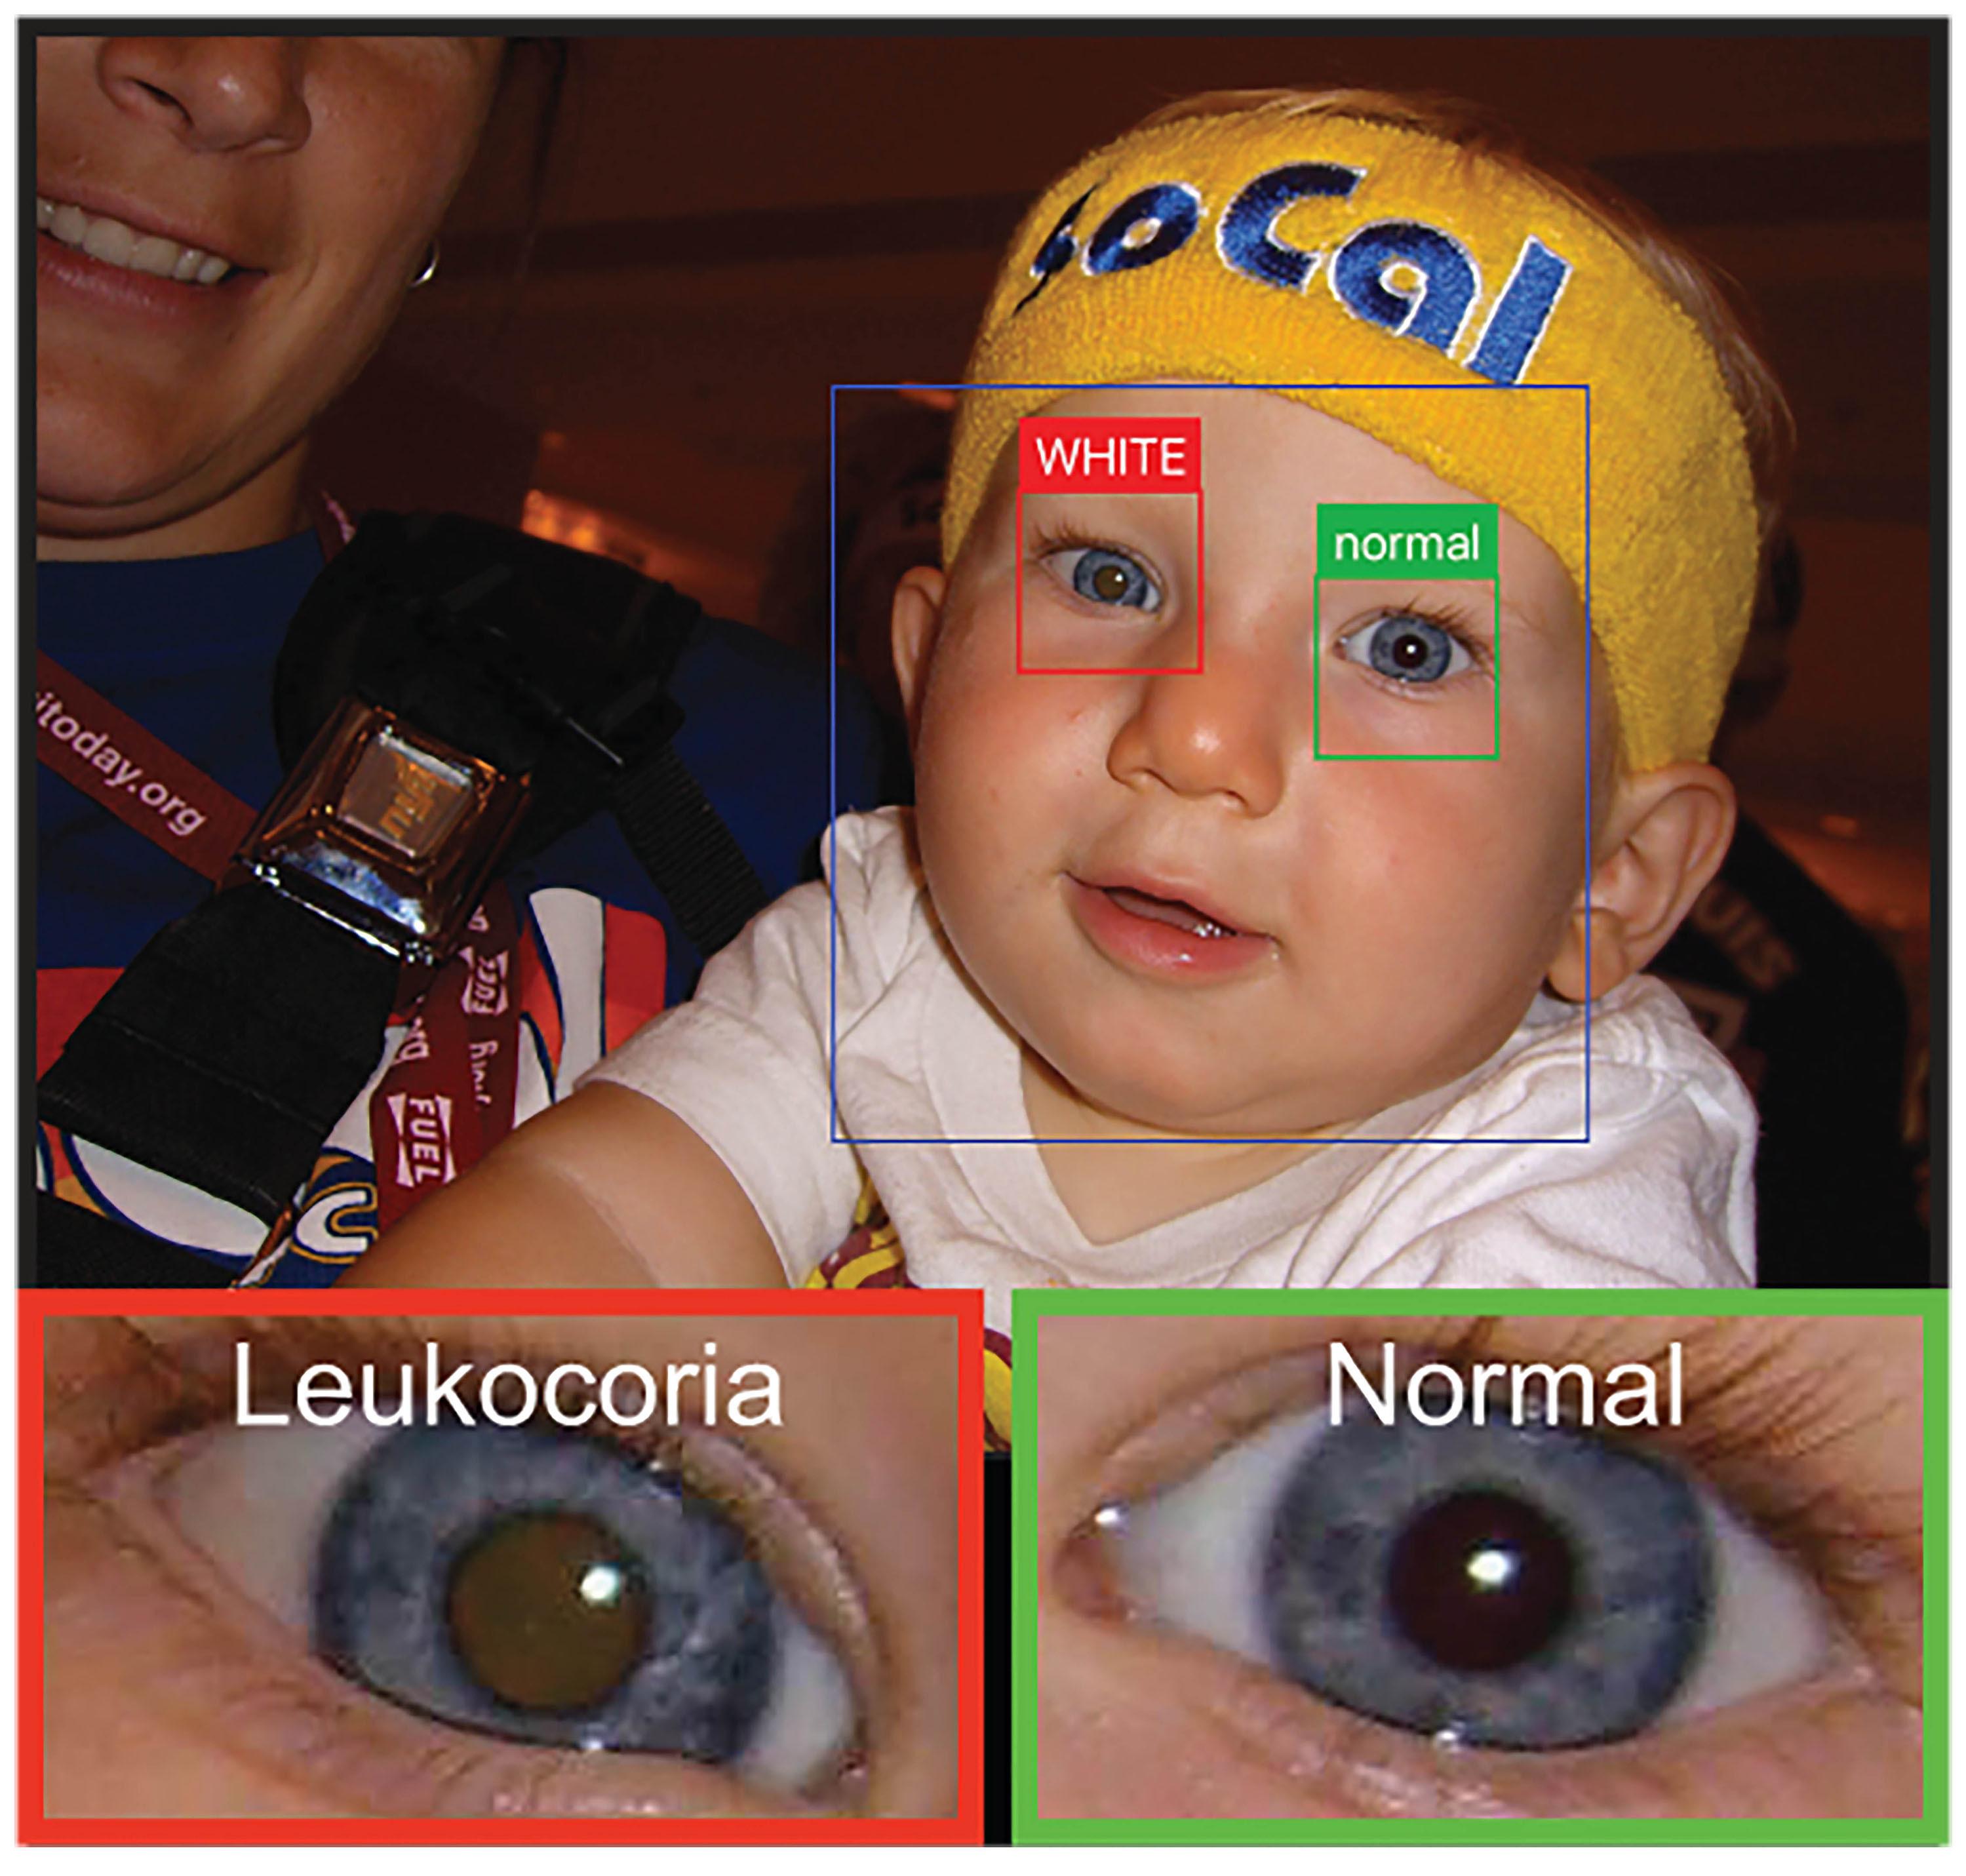 Smartphone App Can Help Detect Leukocoria A Sign Of Eye Cancer Shots Health News Npr